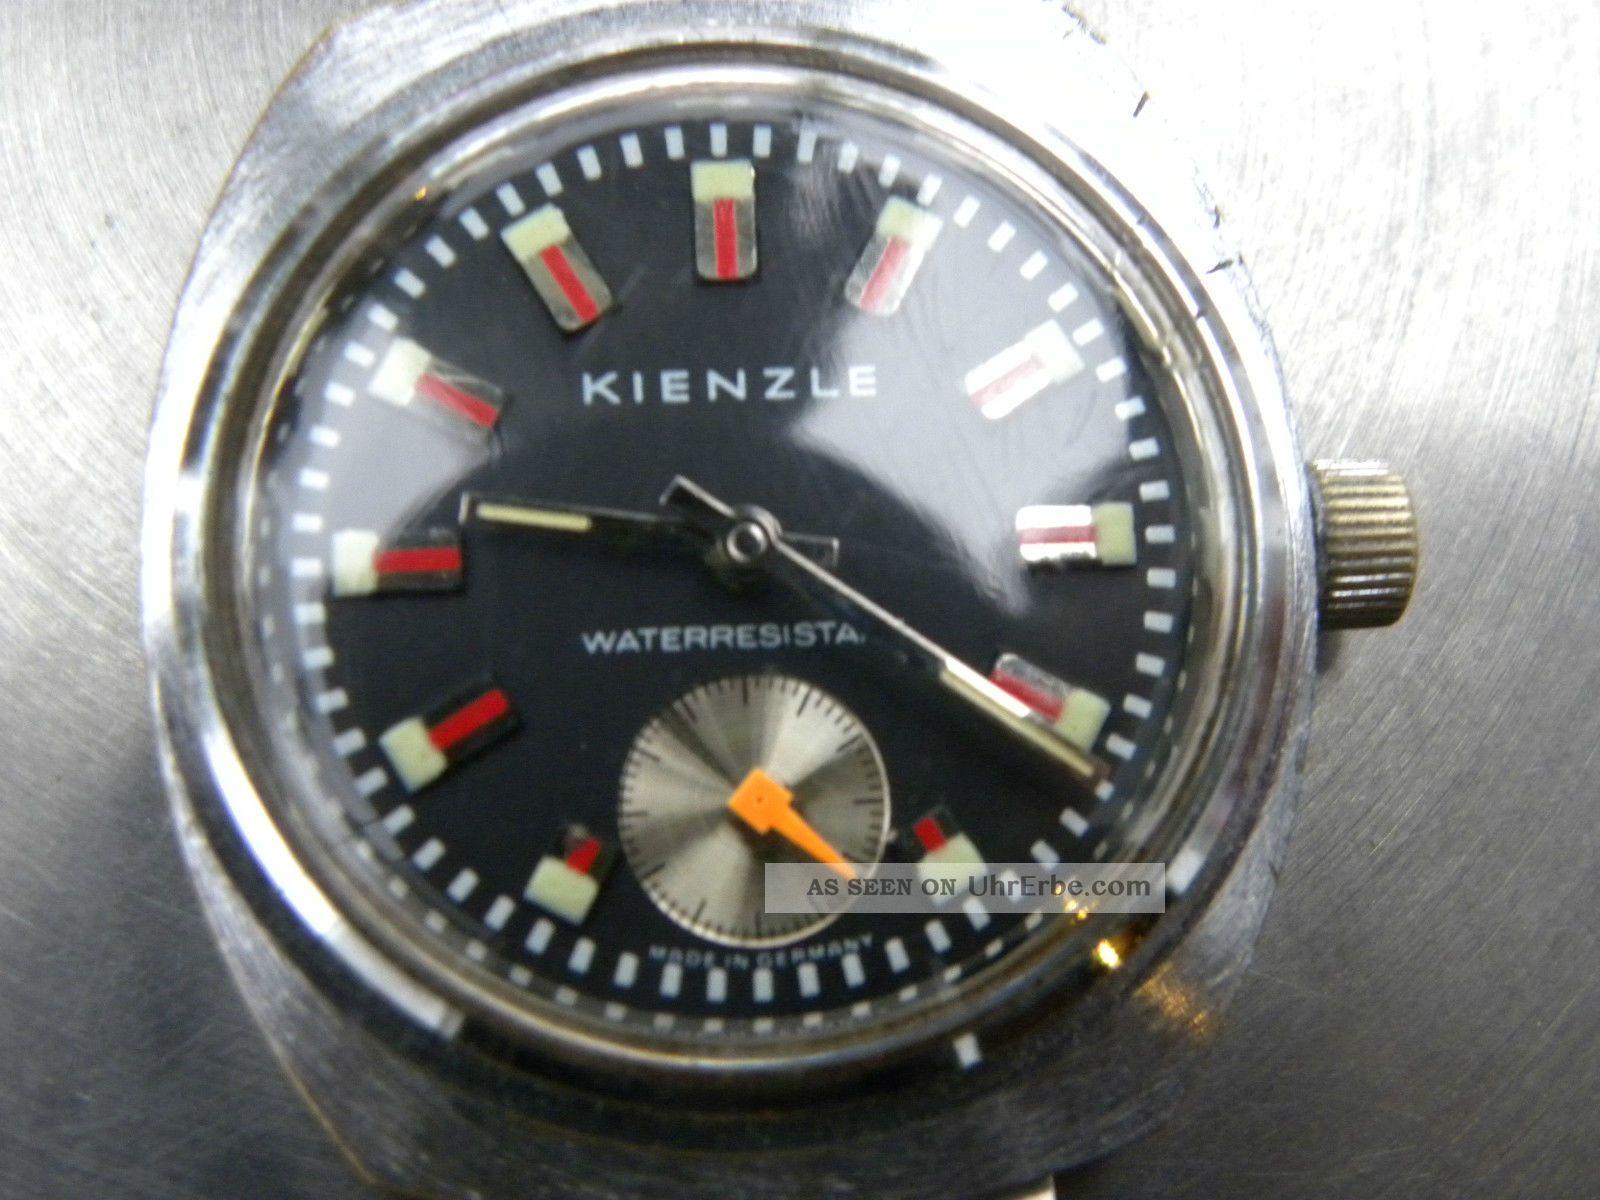 Kienzle Handaufzuguhr Mit Seltenem Zb, Armbanduhren Bild